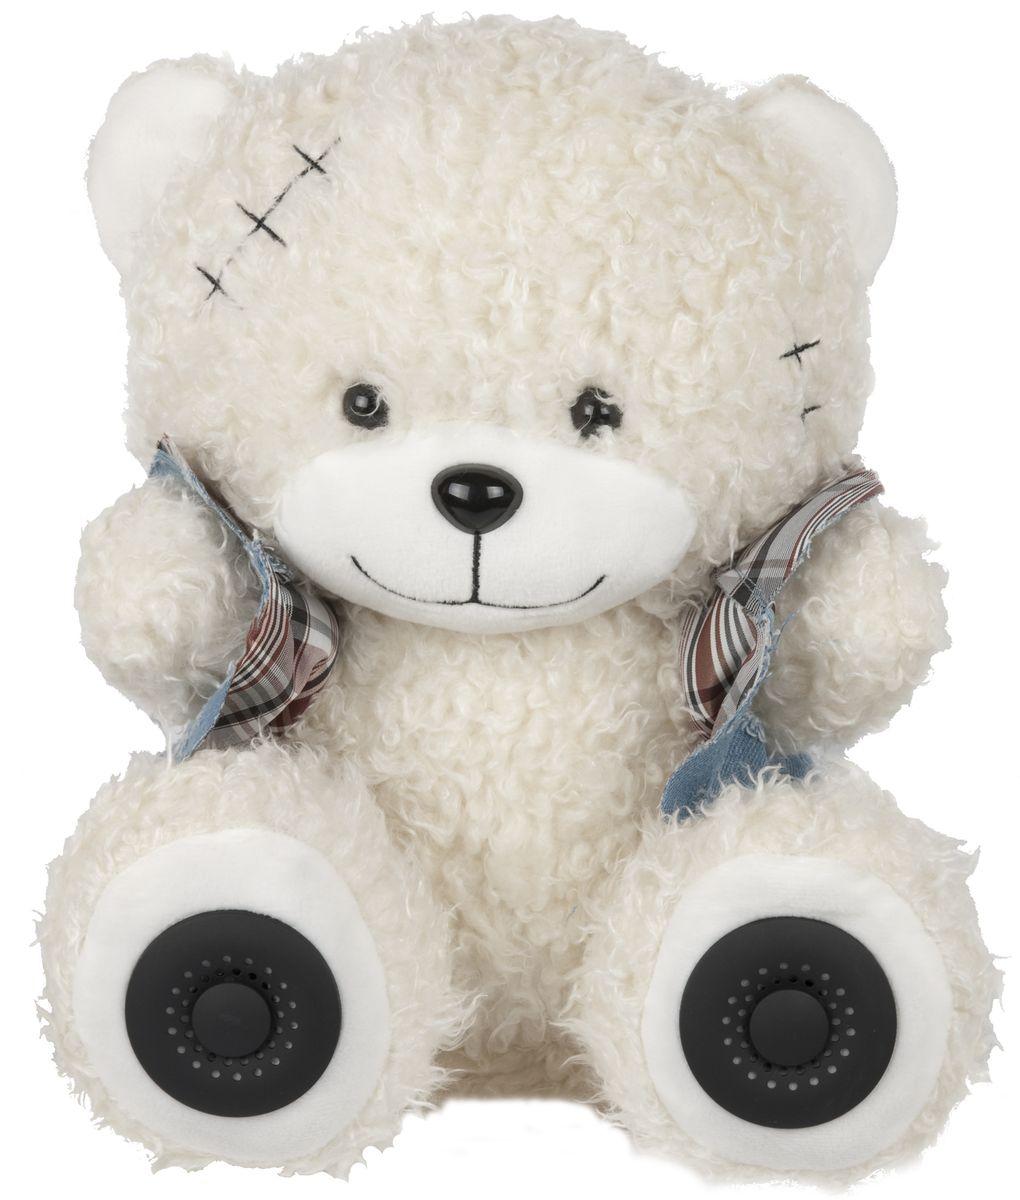 Ritmix ST-150 Bear, White портативная акустическая система